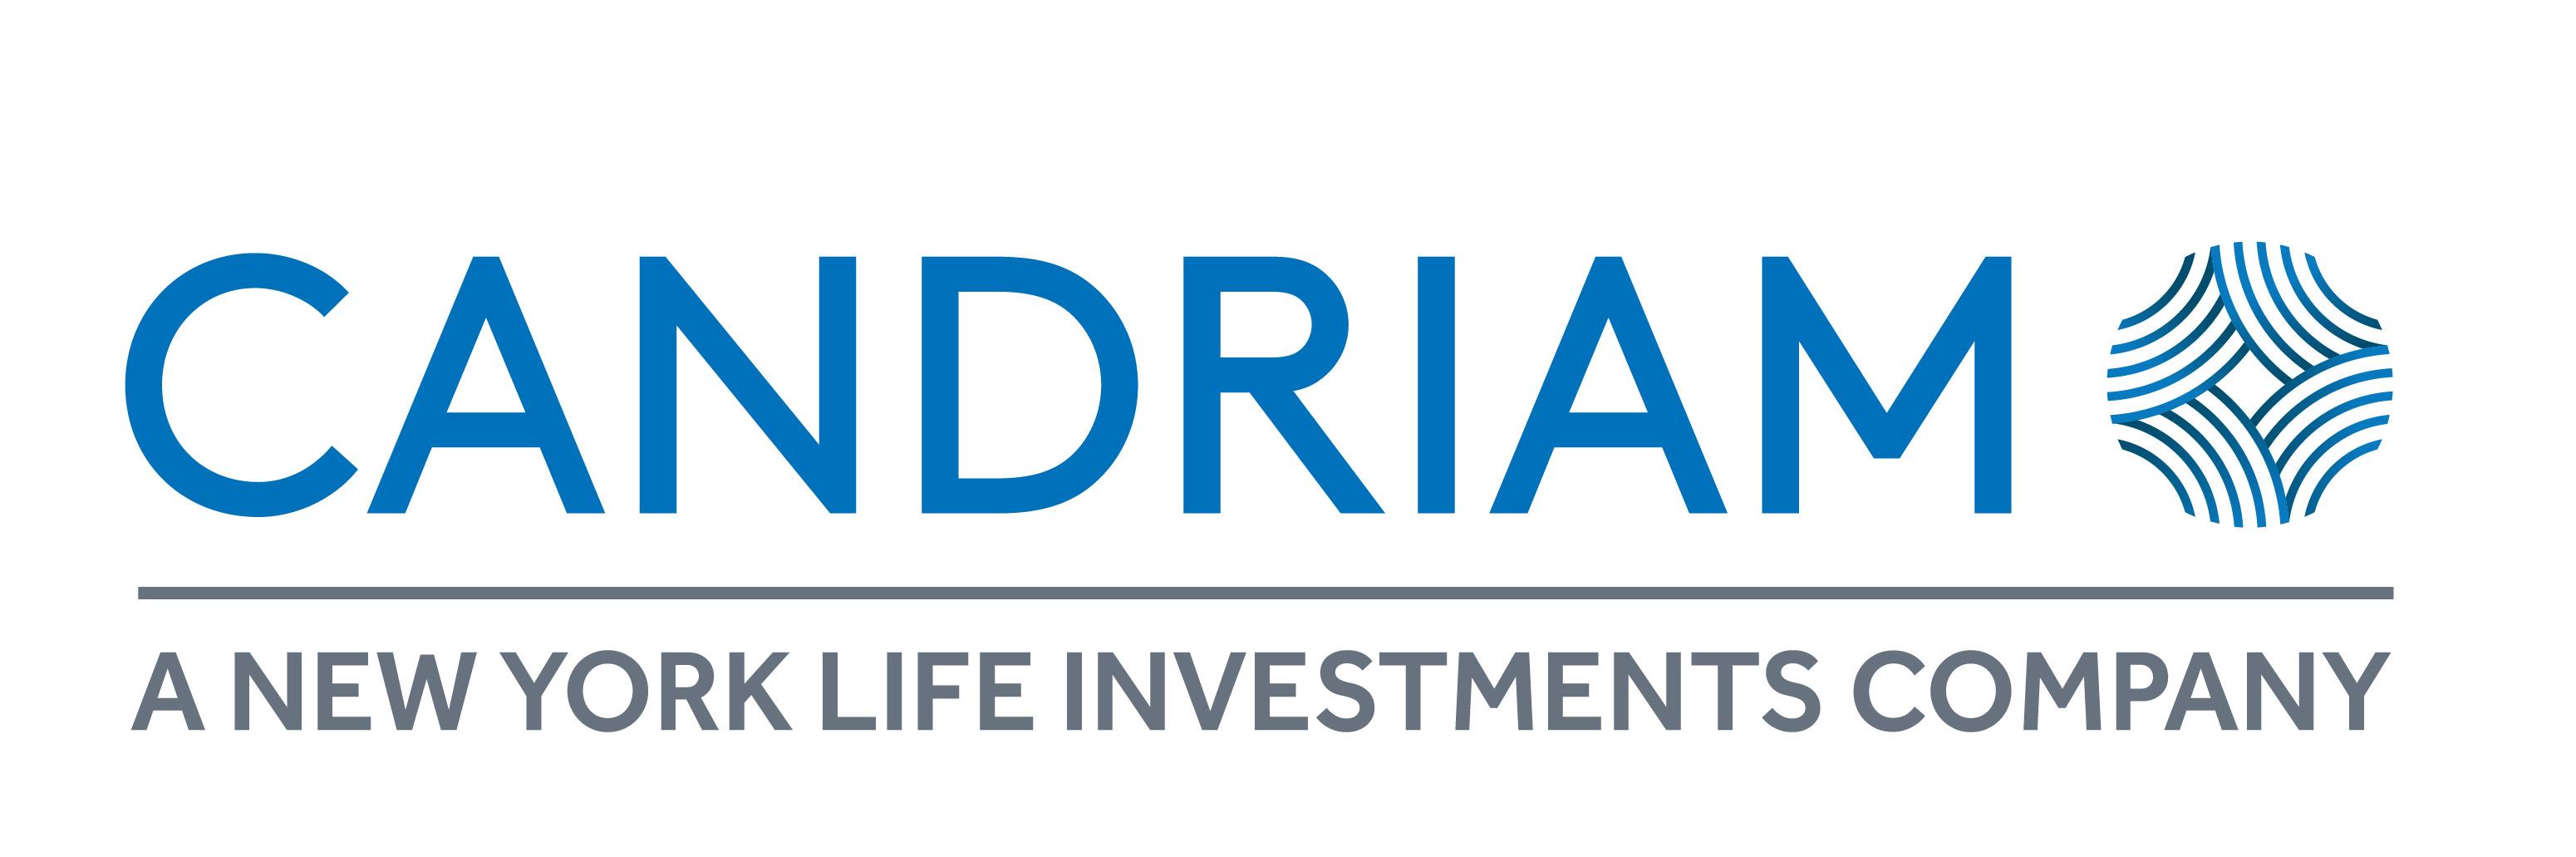 logo-CANDRIAM FRANCE